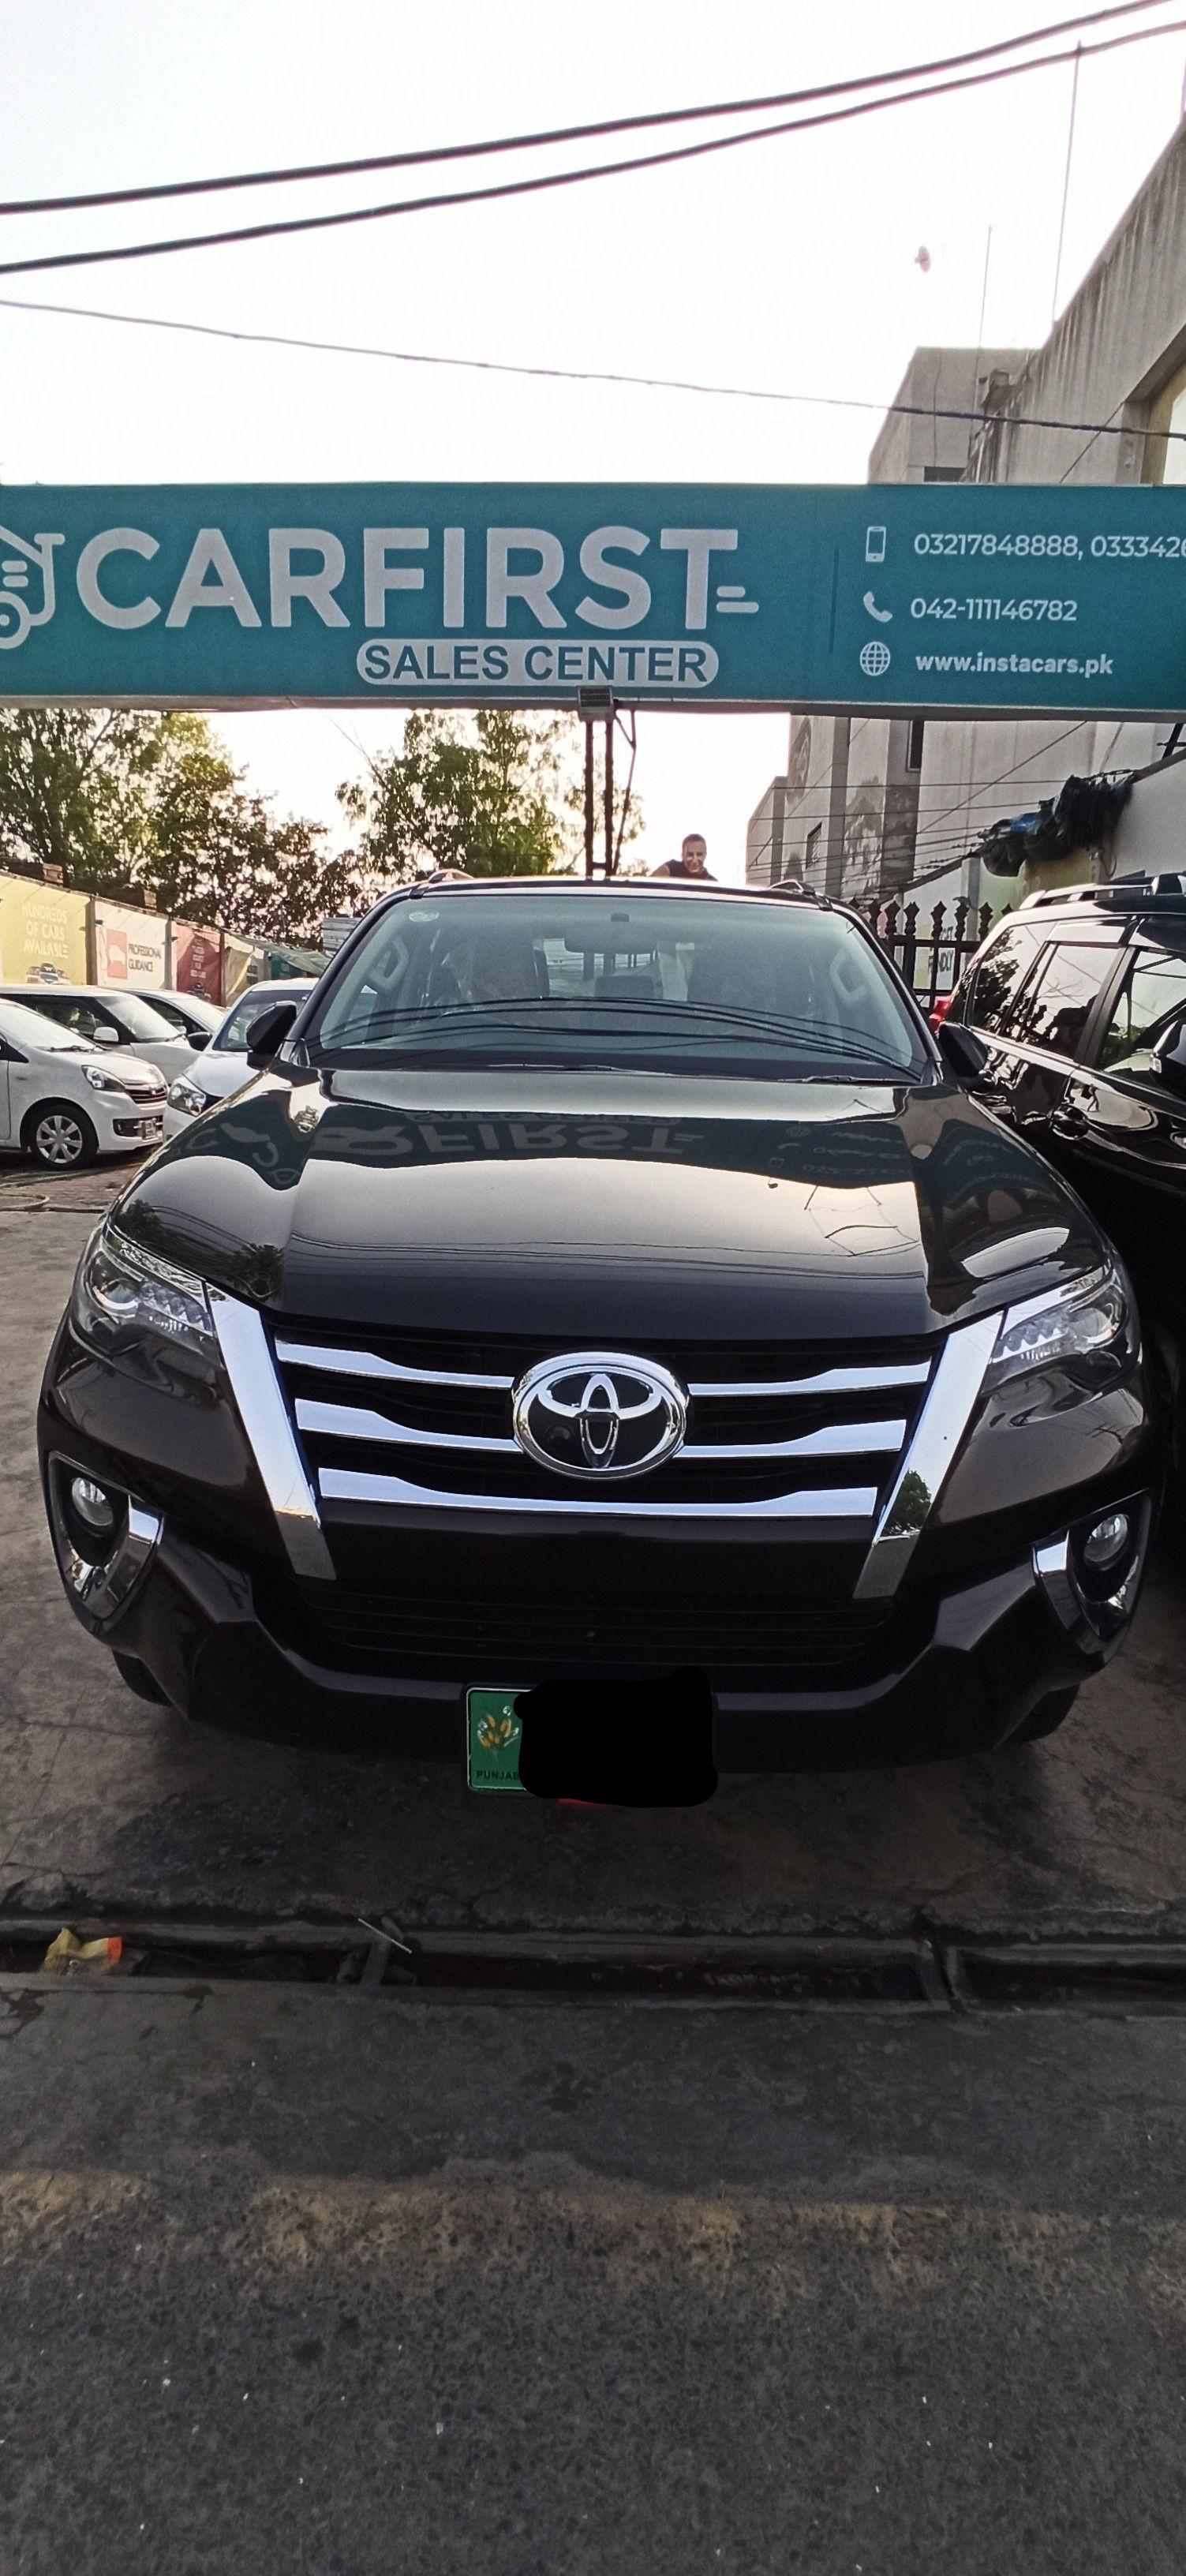 Toyota Fortuner 2.7 VVT-i